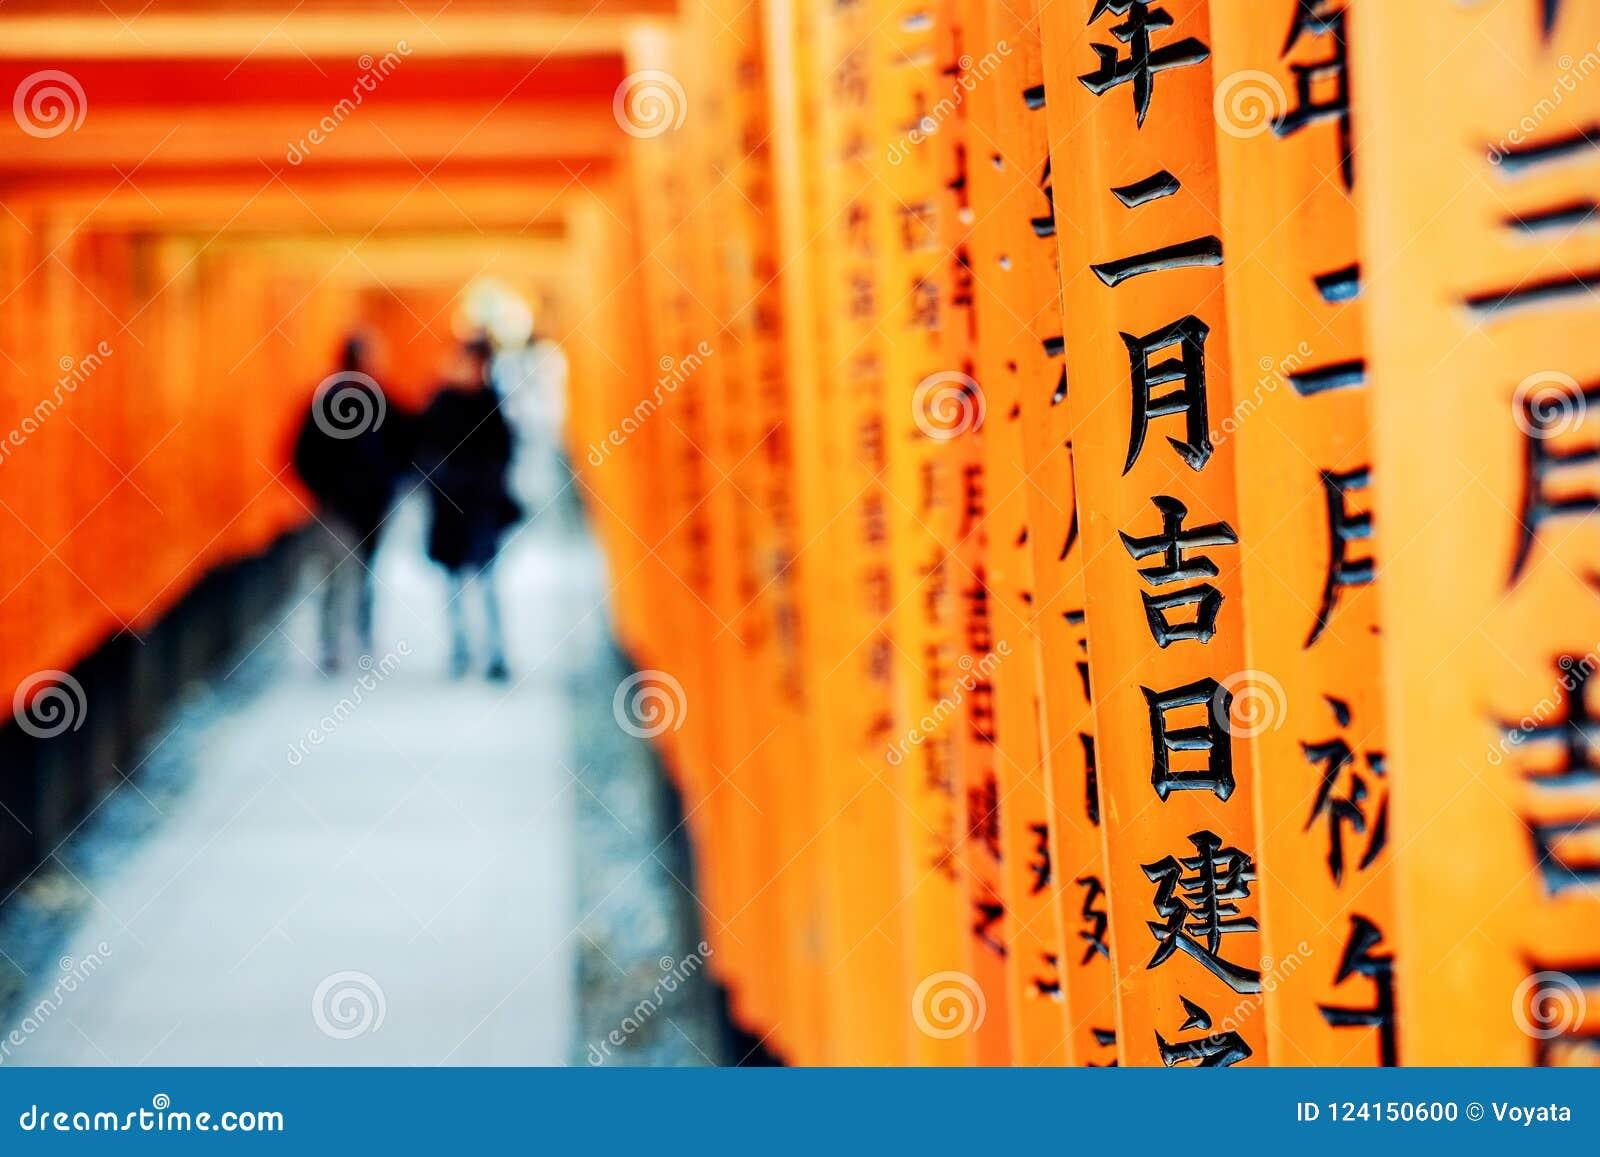 Röd portväg, toriikorridor i Fushimi Inari Taisha, Kyoto, Japan